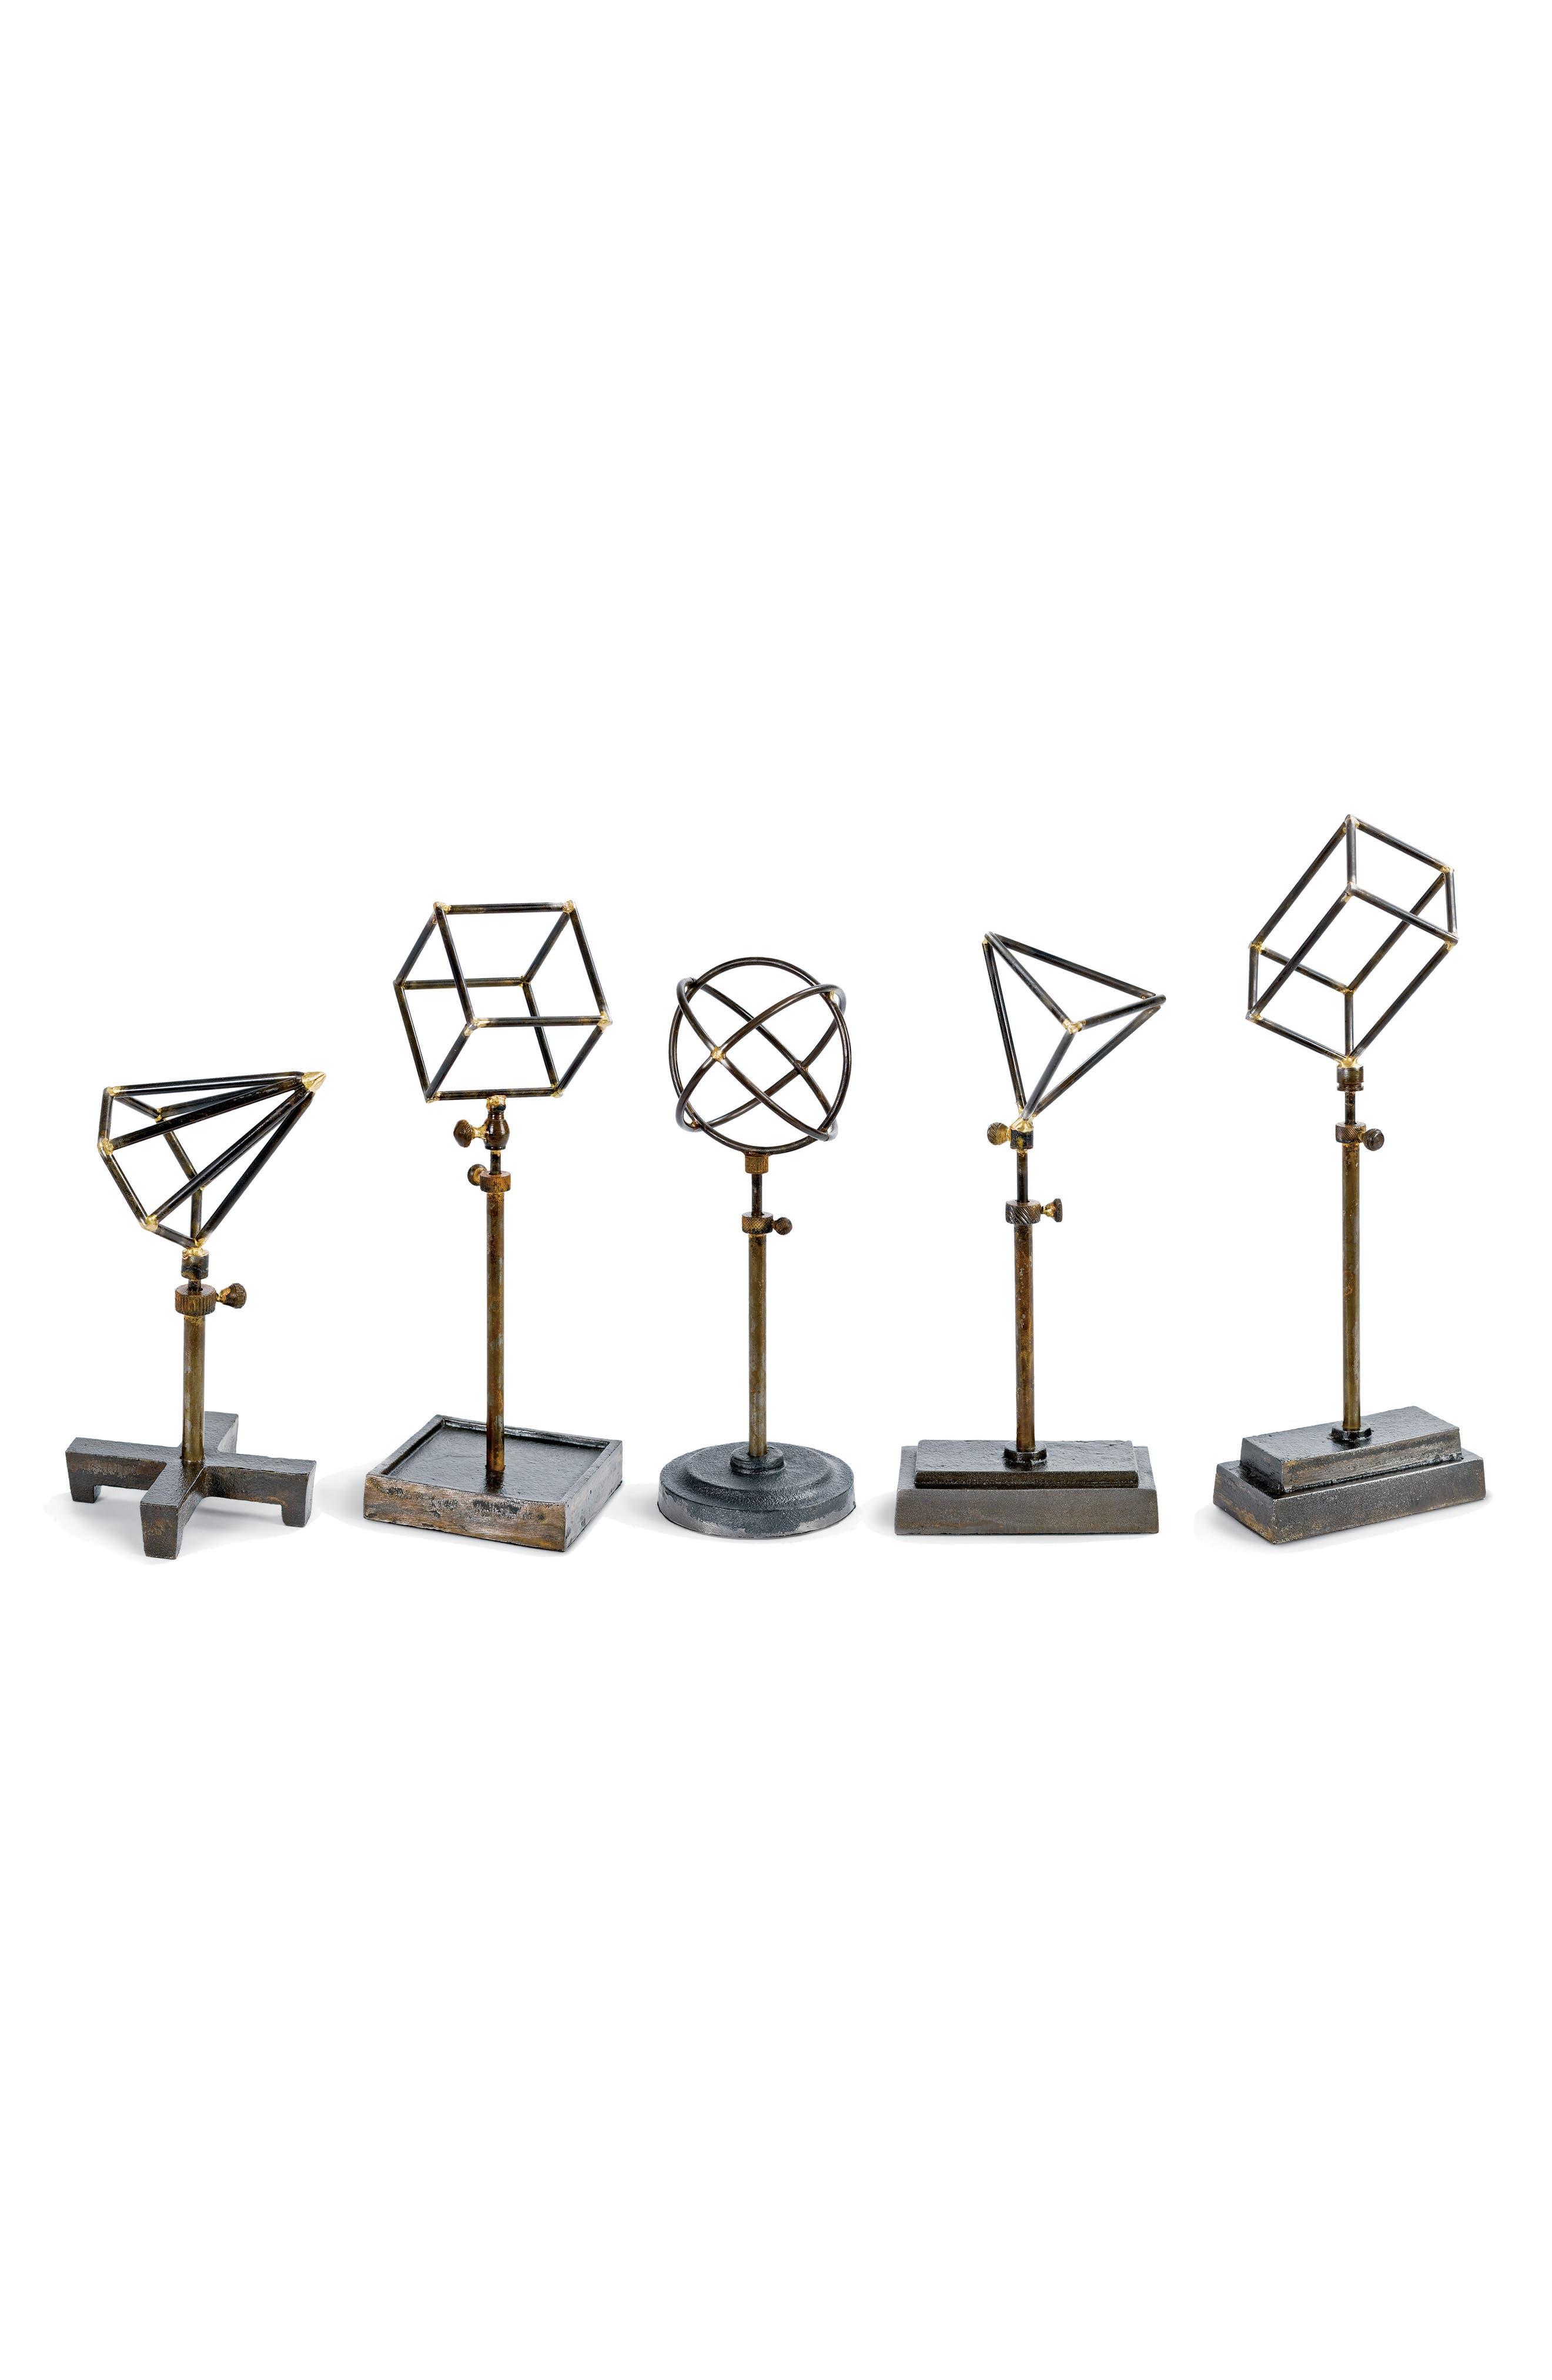 Set of 5 Geometric Sculptures,                         Main,                         color, BRASS